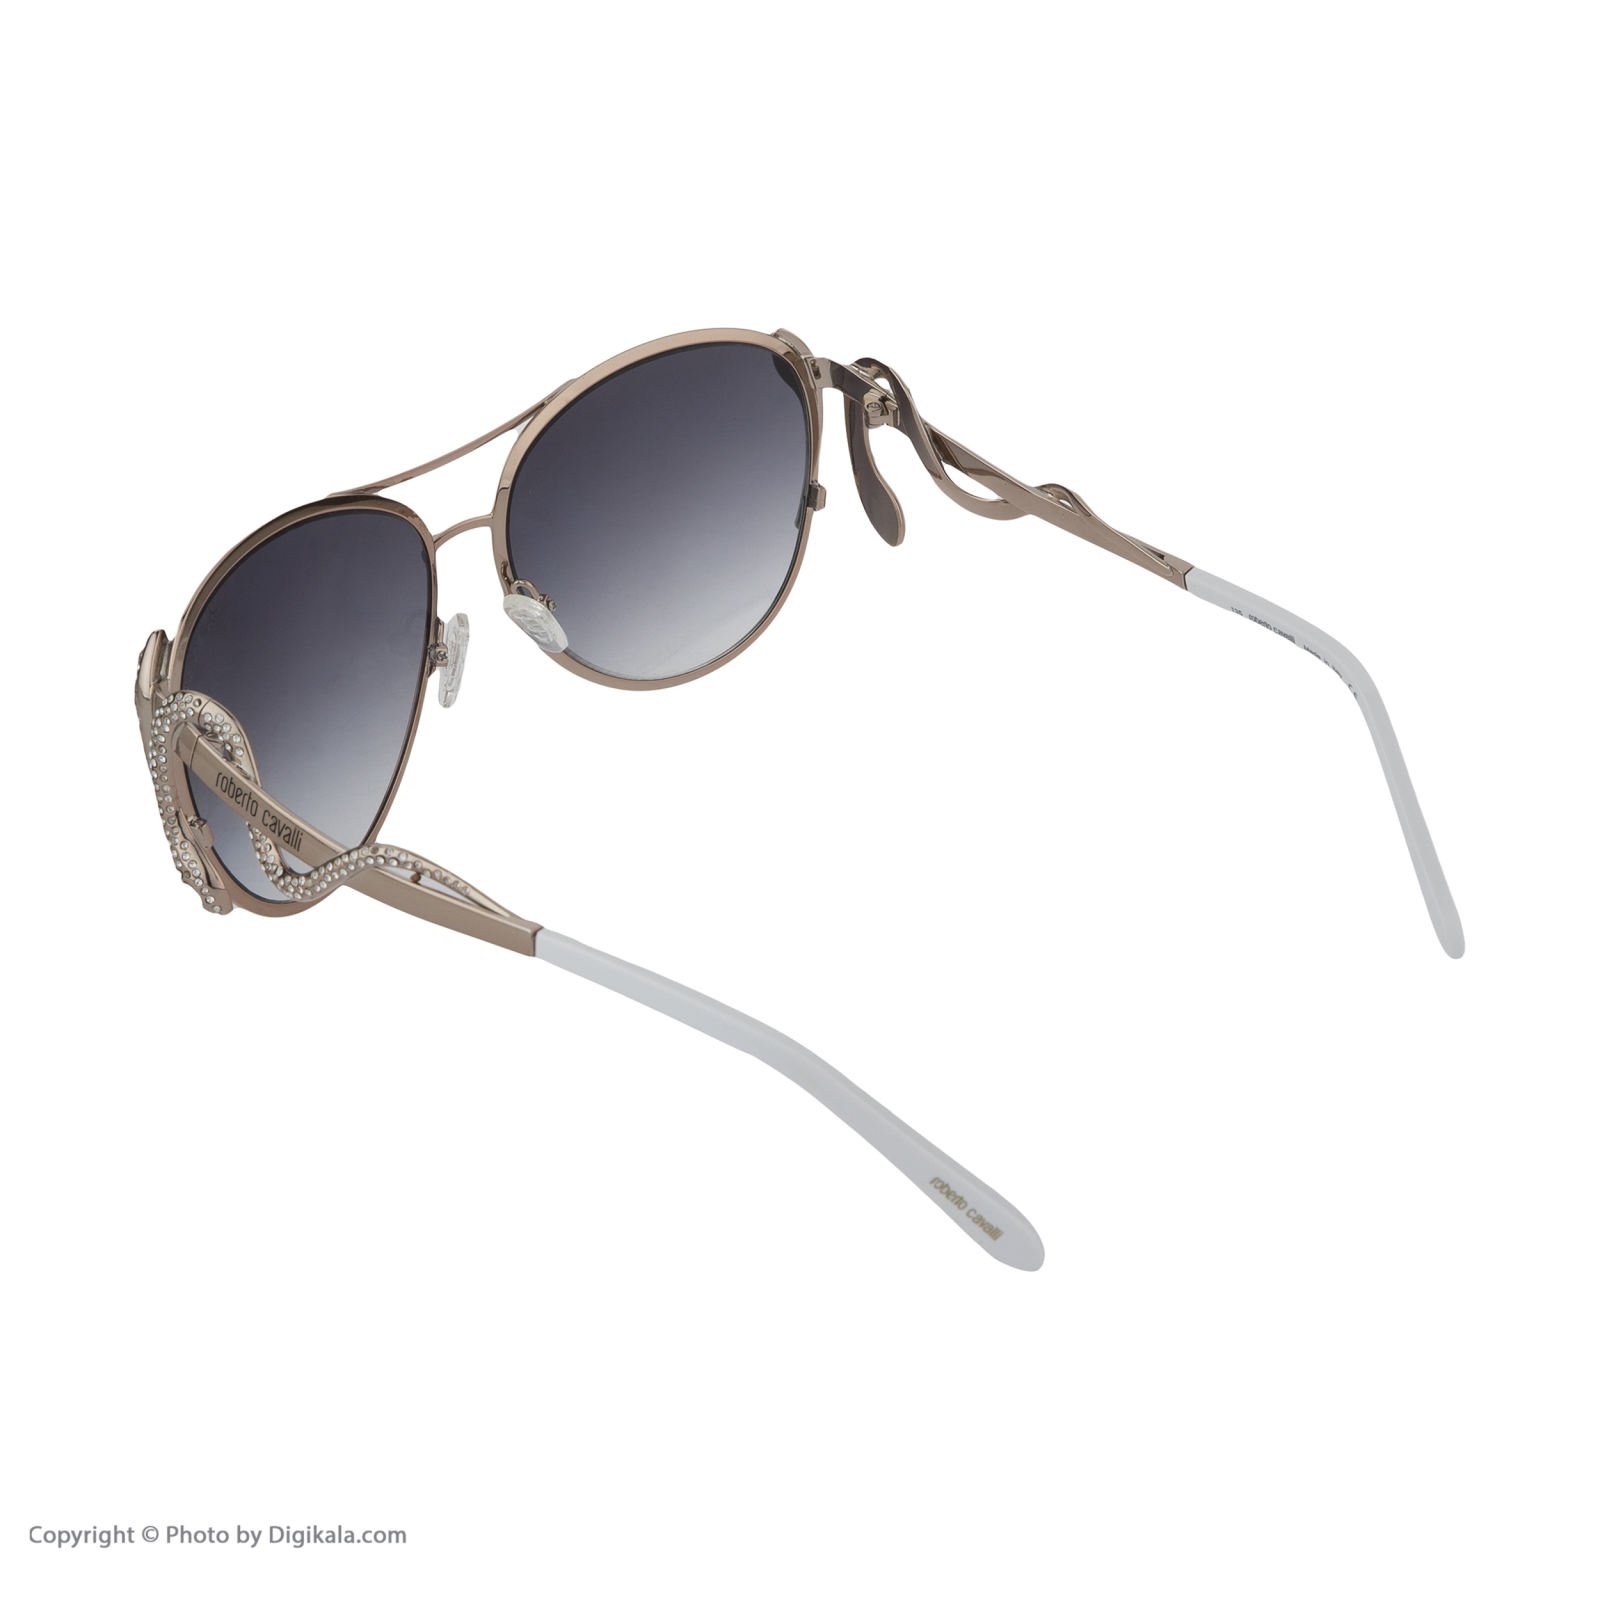 عینک آفتابی زنانه روبرتو کاوالی مدل 909 -  - 5